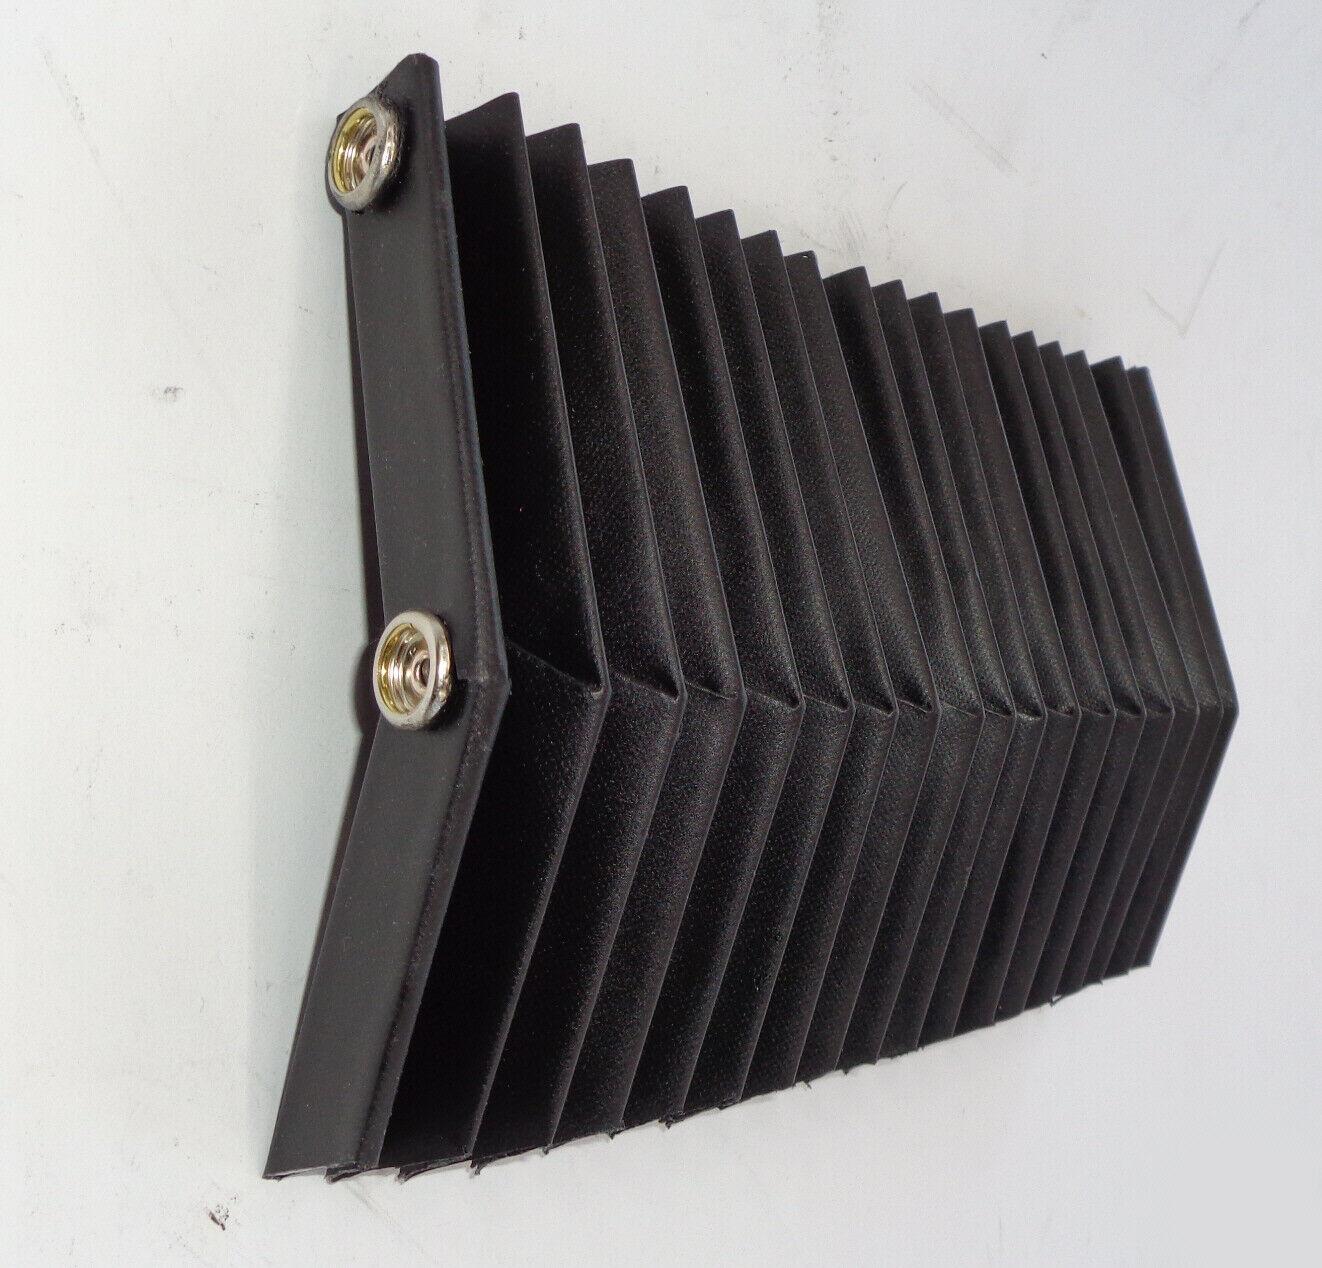 Balg für Maho MH 500W Fräsmaschine X